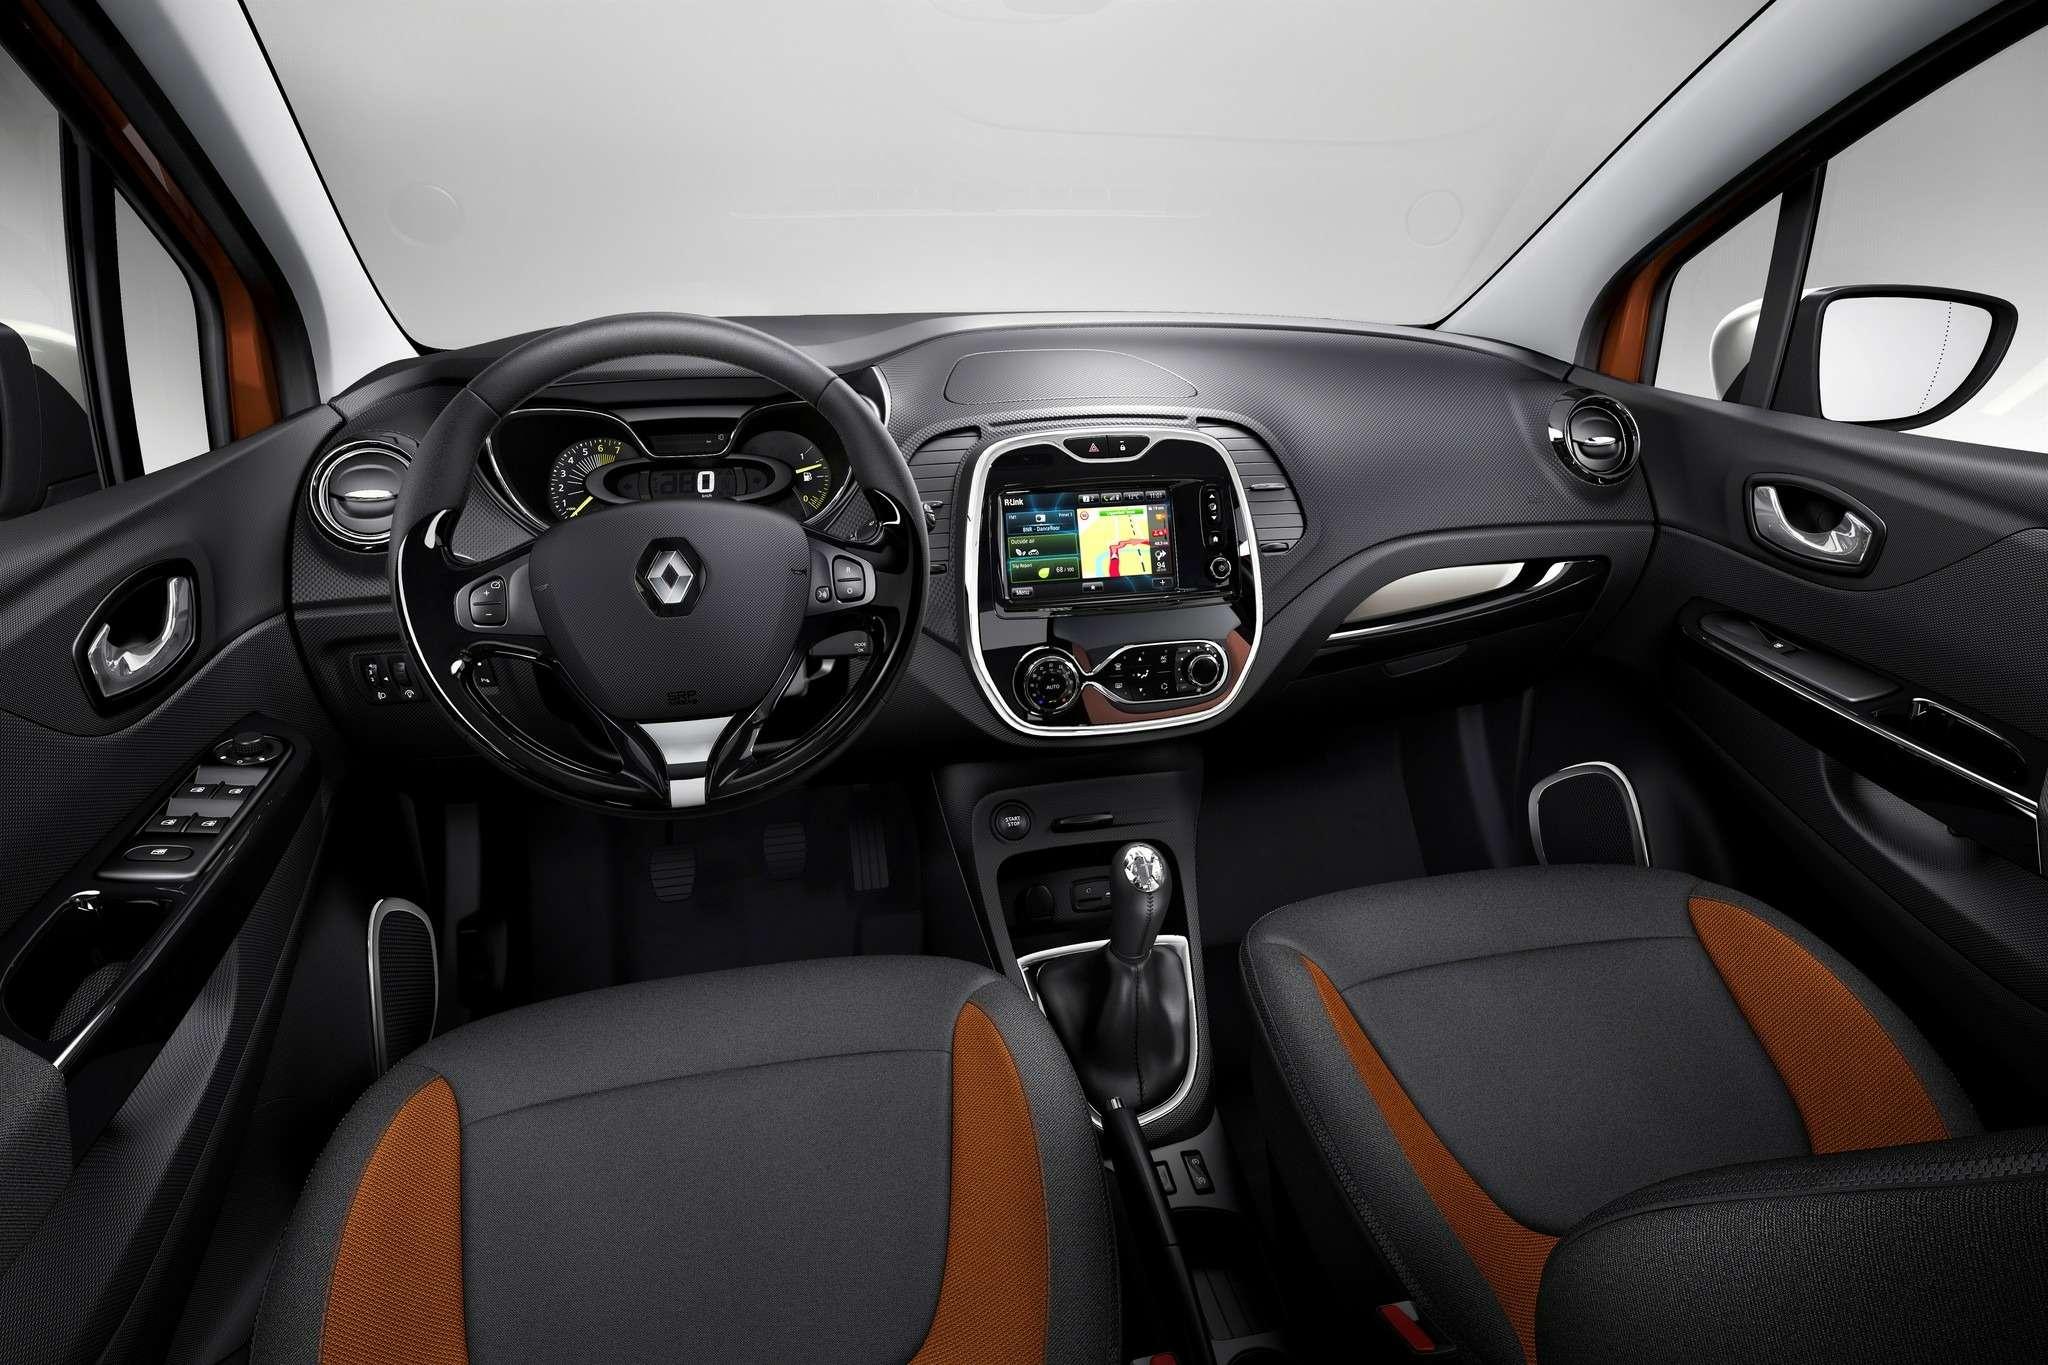 Renault_42130_global_no_copyright (4)